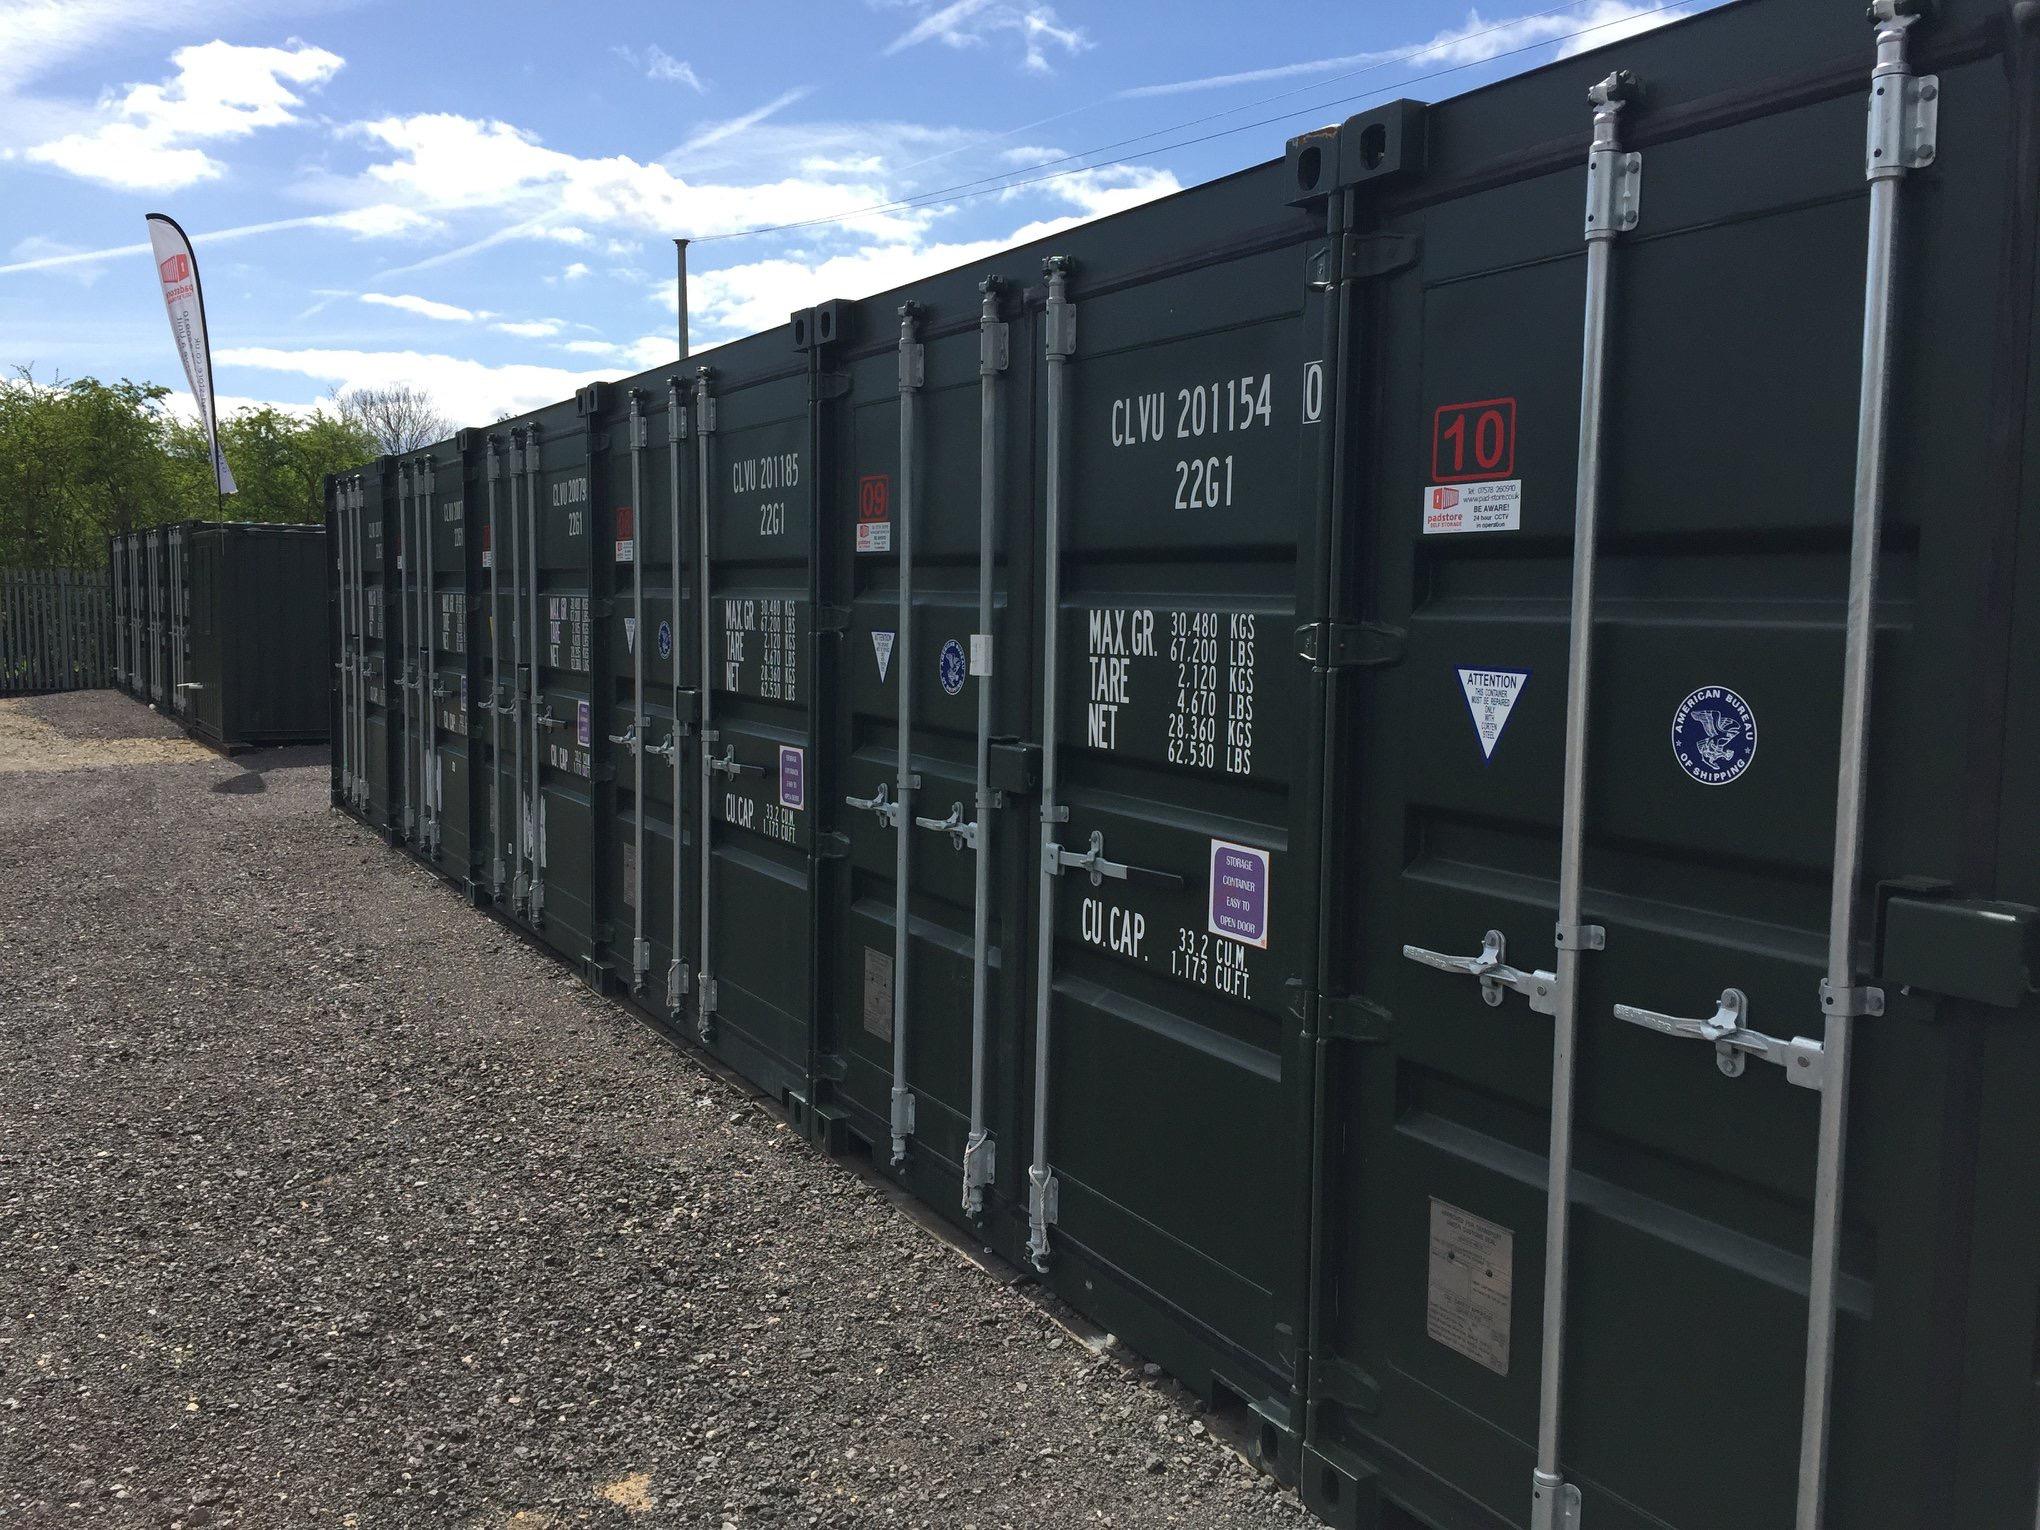 PadStore Self Storage - Sleaford a storage company in Royal Oak Bridge, East Road, Lincolnshire, Sleaford, UK